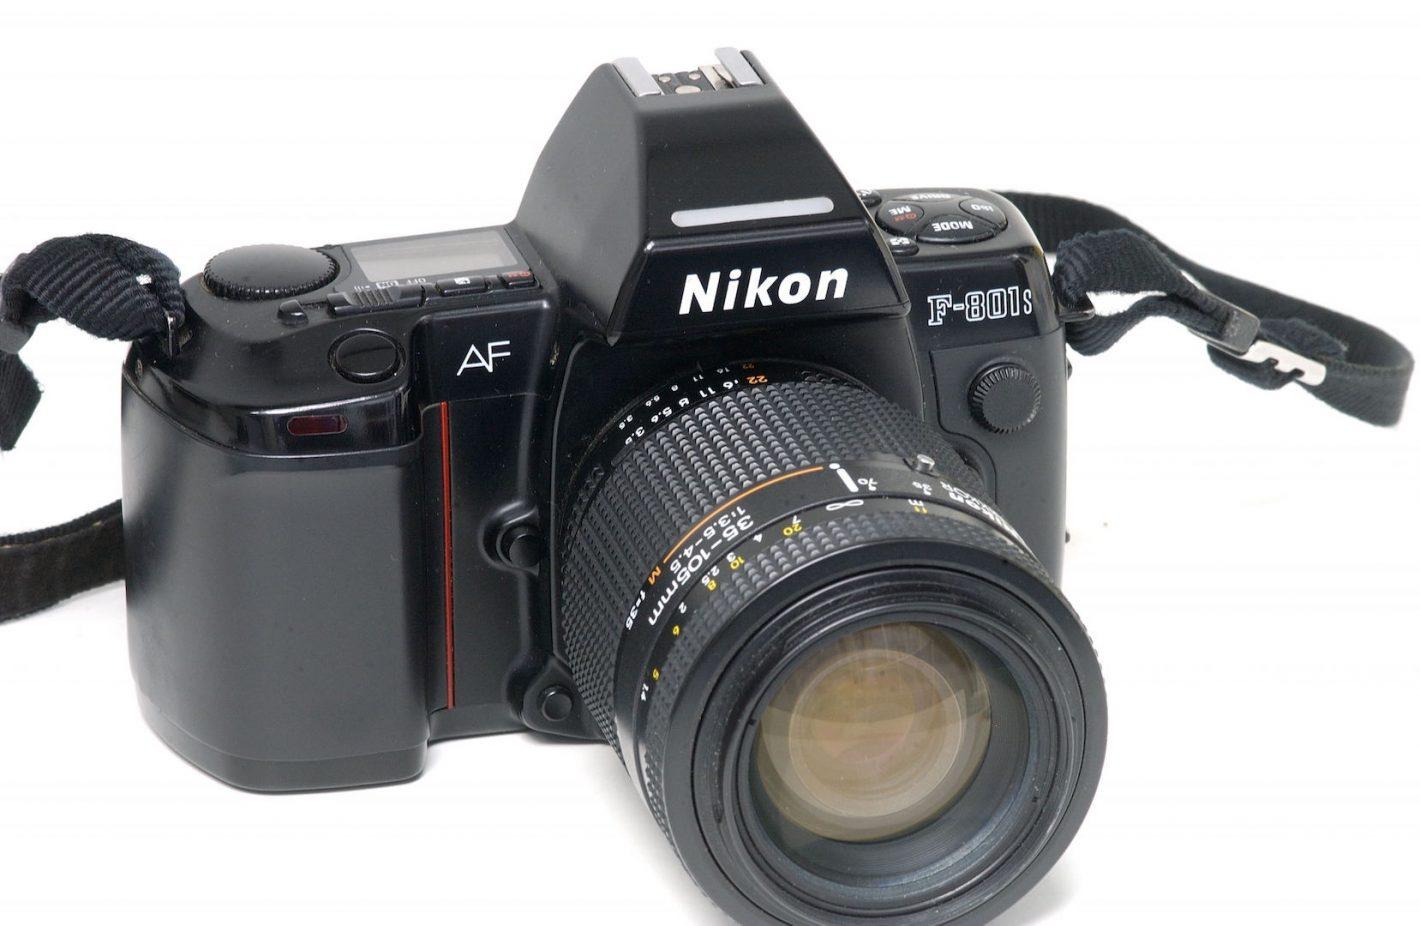 Boitiers Nikon F 801s avec Nikkor 35-105 mm f3.5